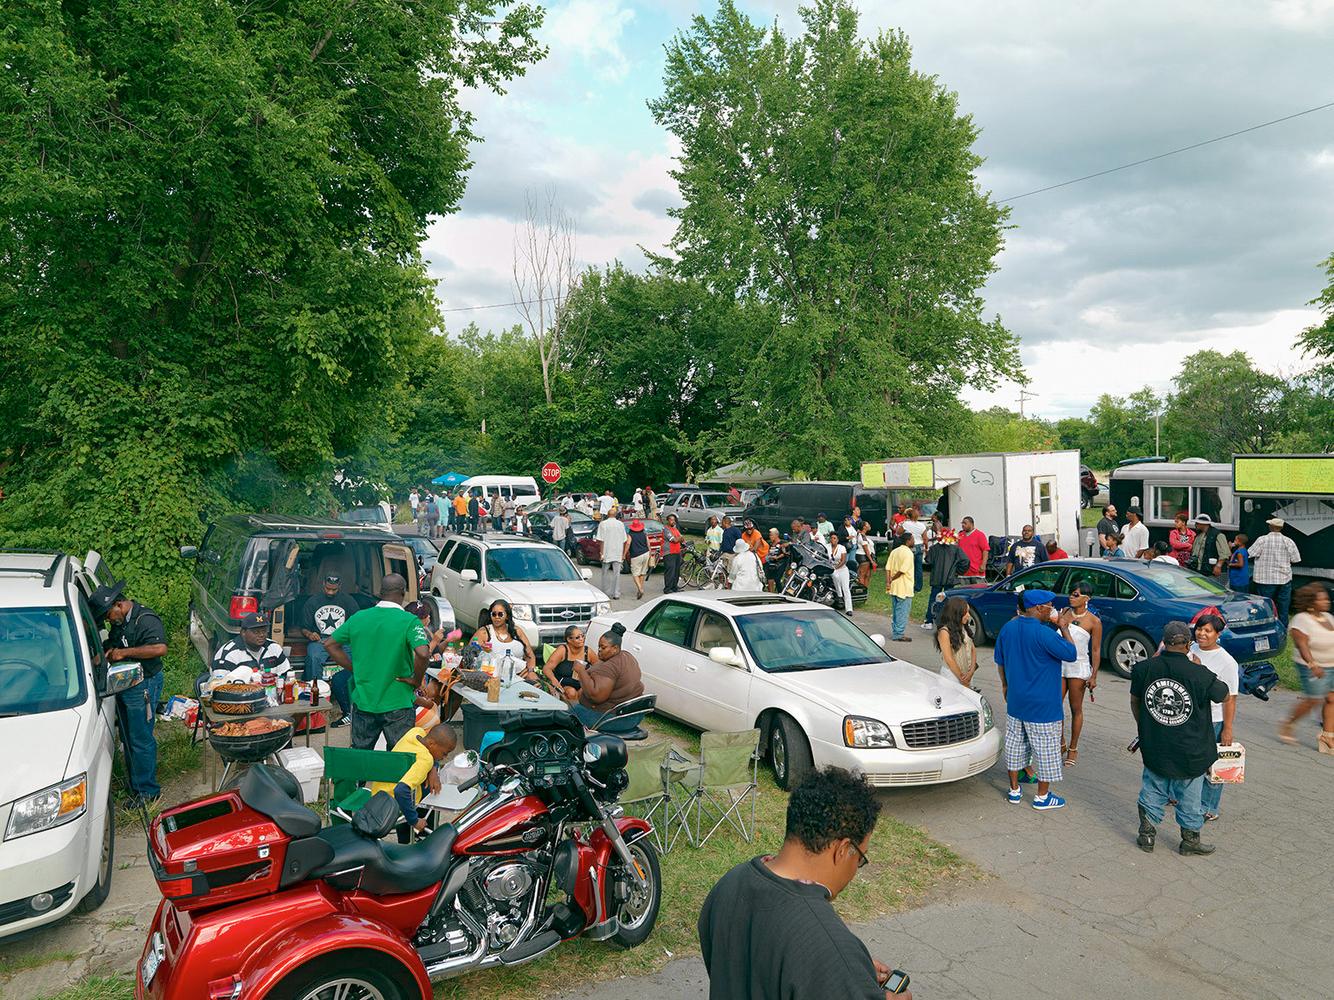 Crowd Gathering, St. Aubin Outdoor Music Festival, Eastside, Detroit 2013